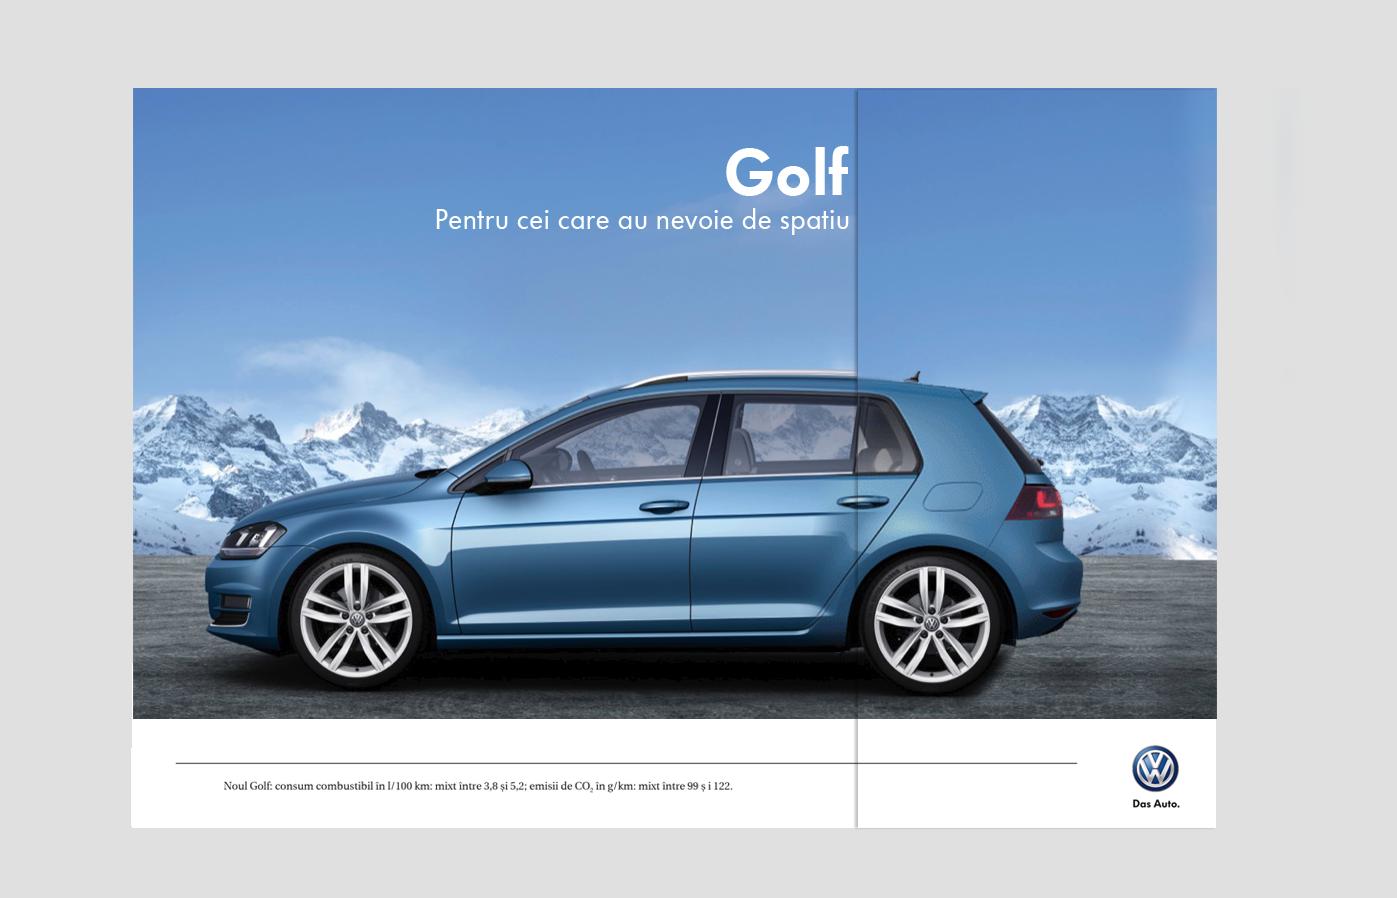 VW revista a